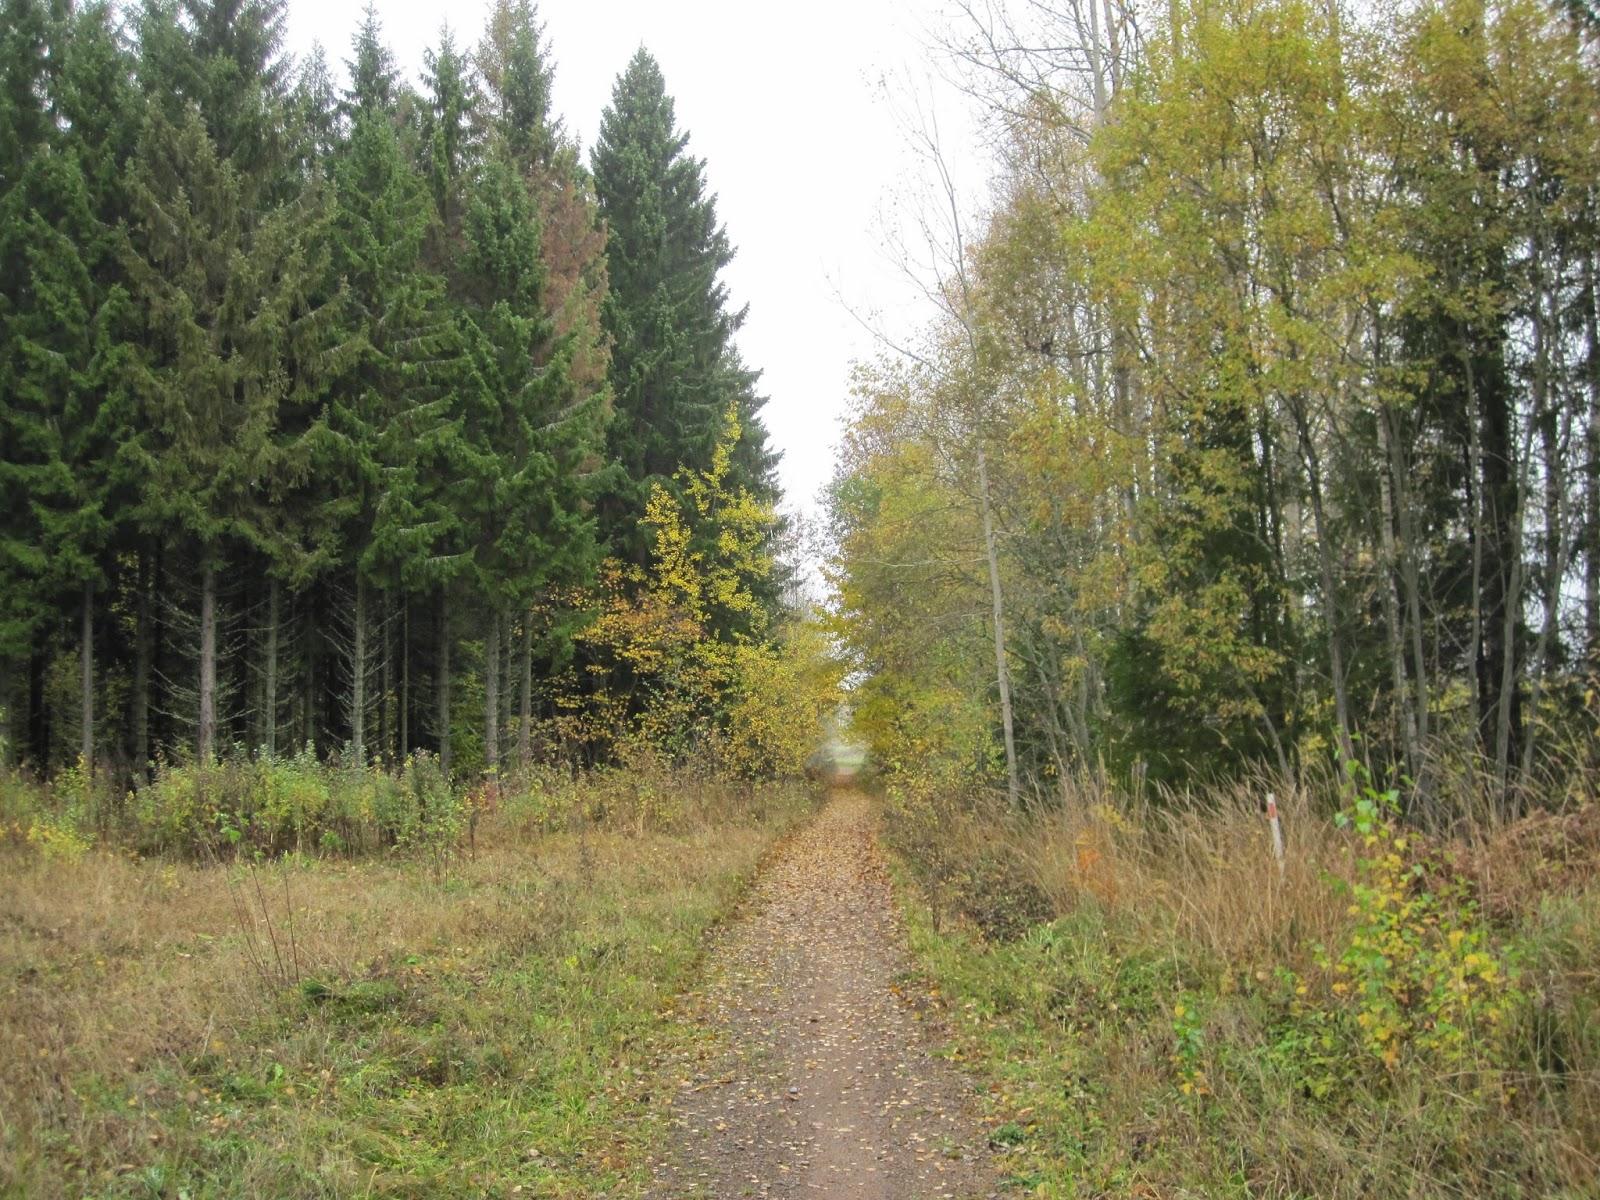 Kotteland & fridhemsparadiset: oktober 2014